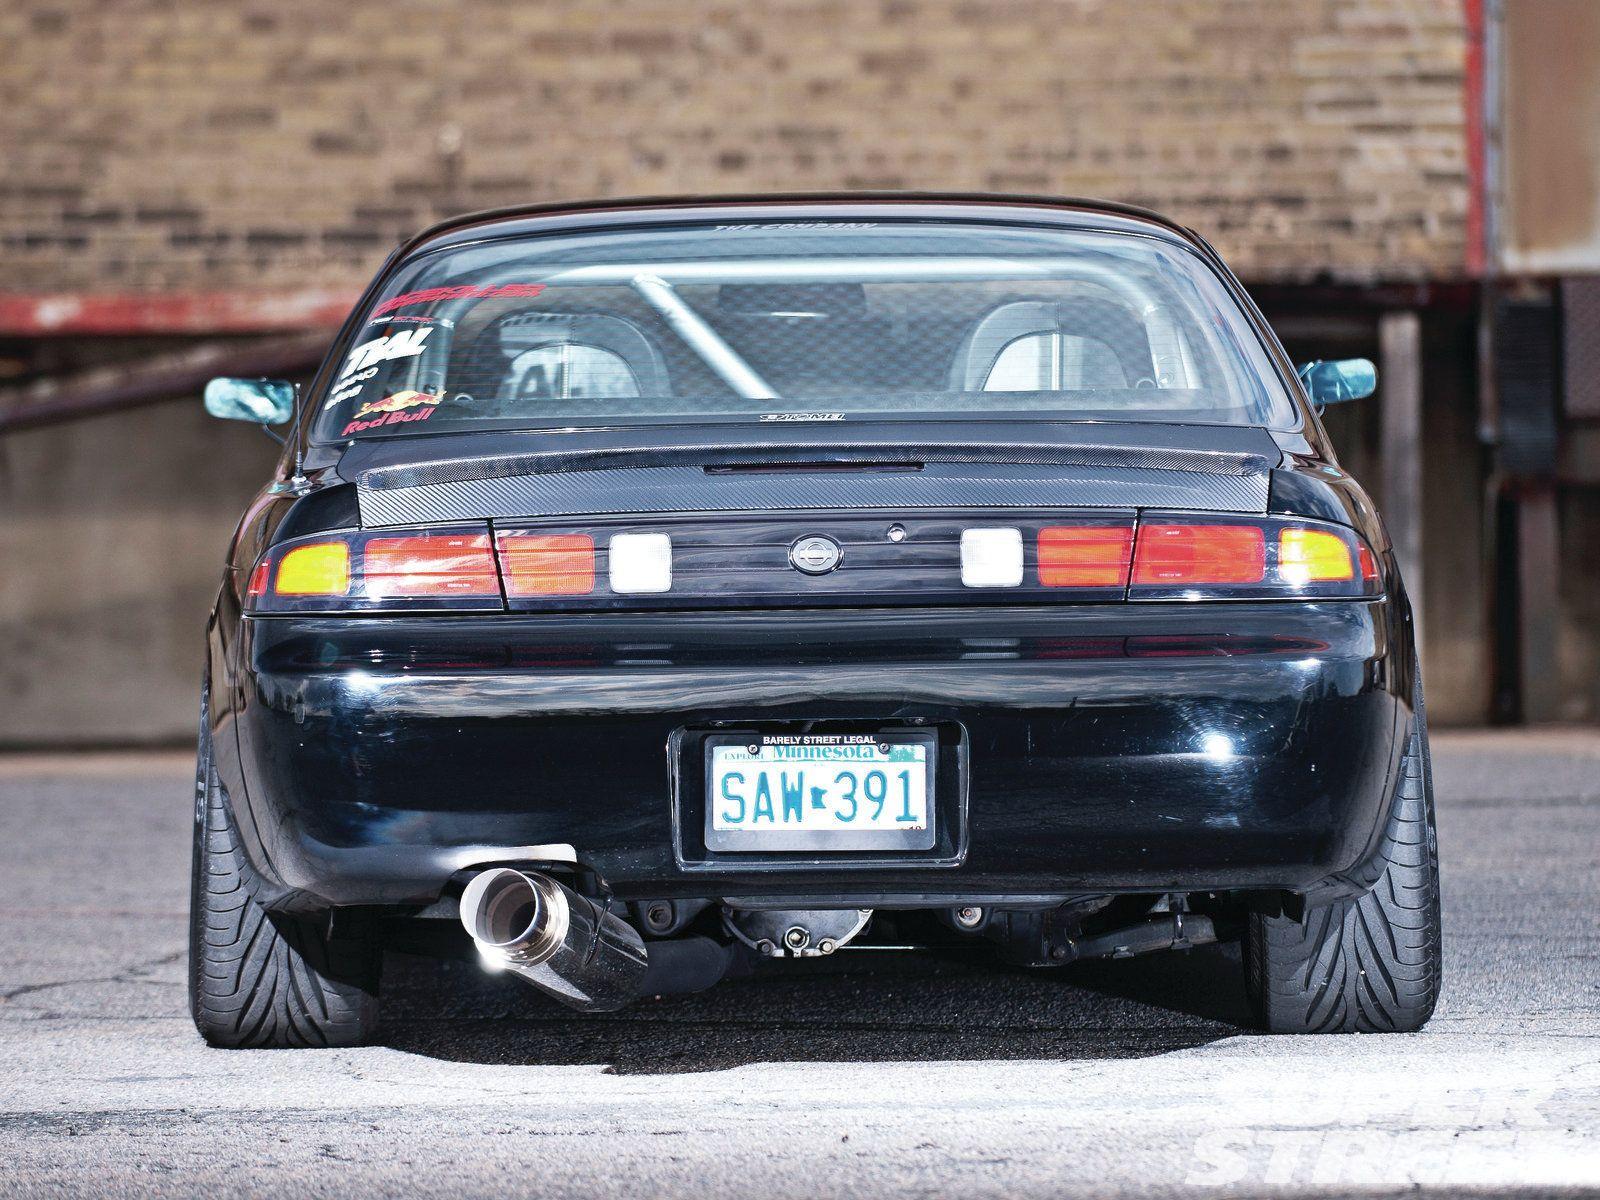 Nissan 240sx 1998 nissan 240sx